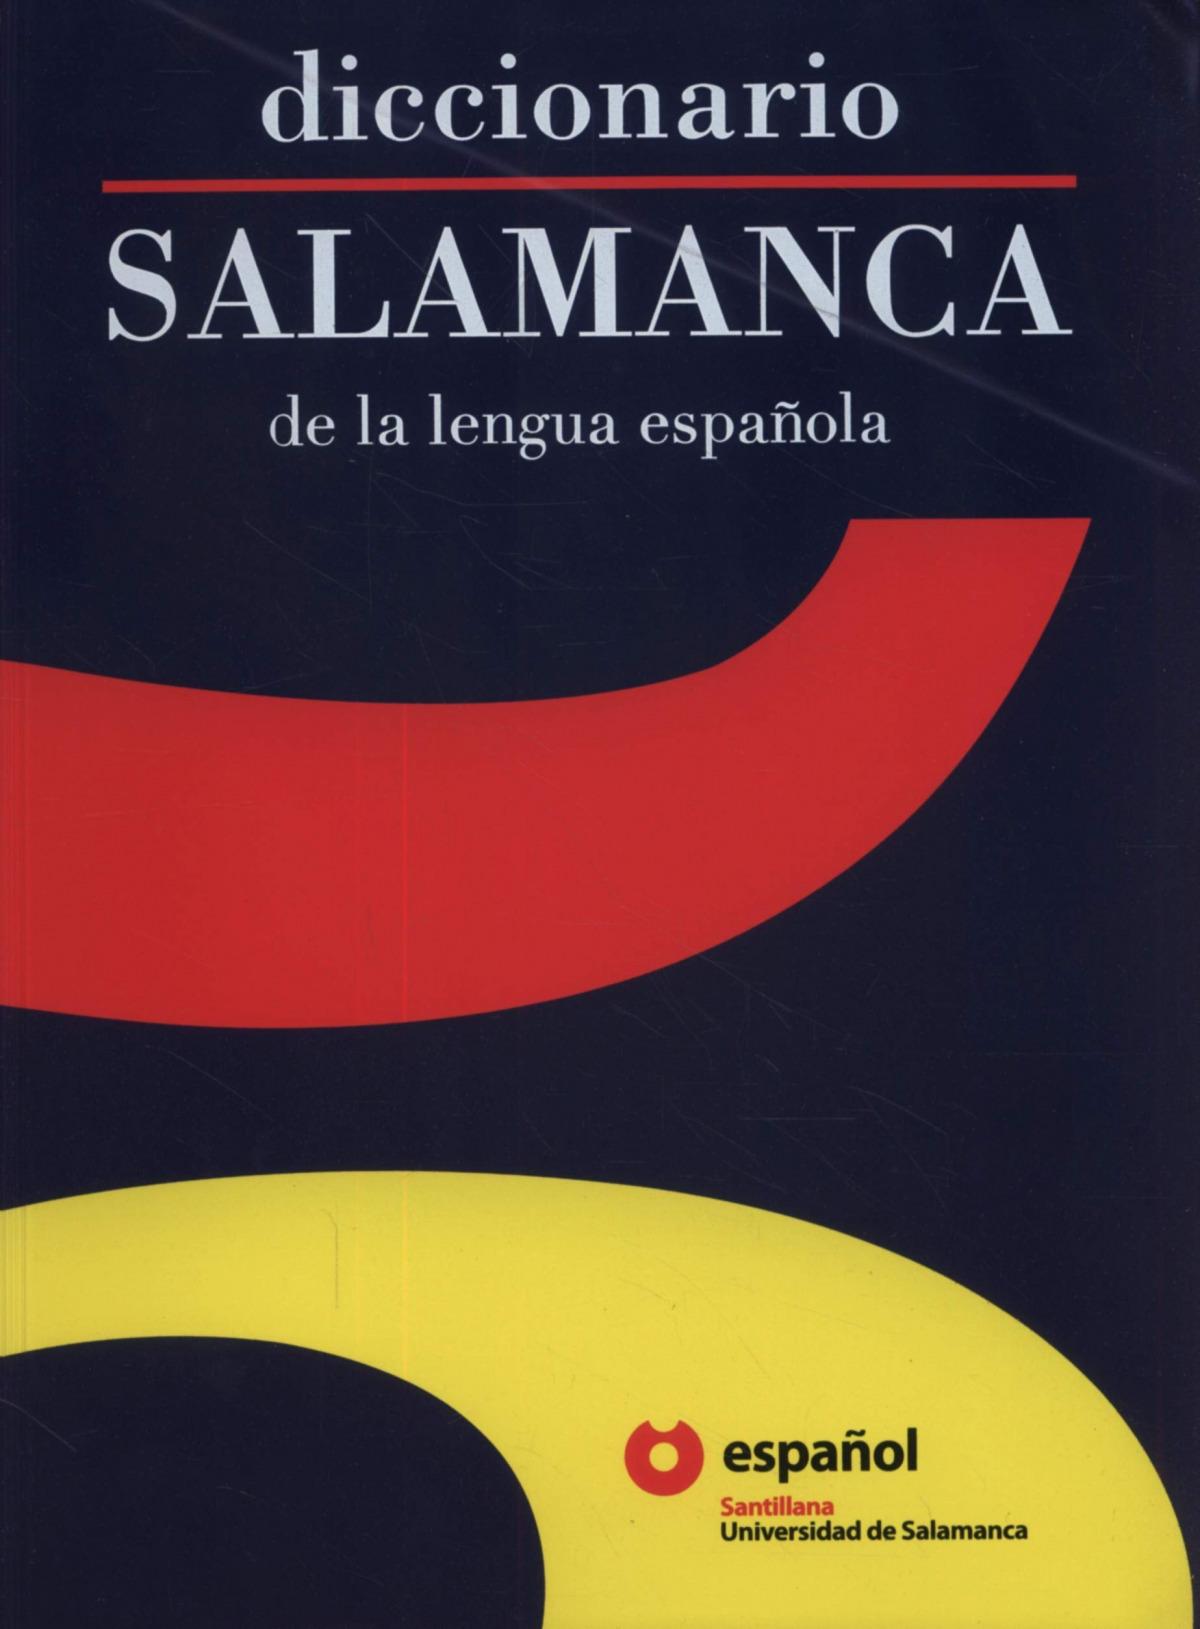 Diccionario Salamanca español para extranjeros ed.2006 9788493453749